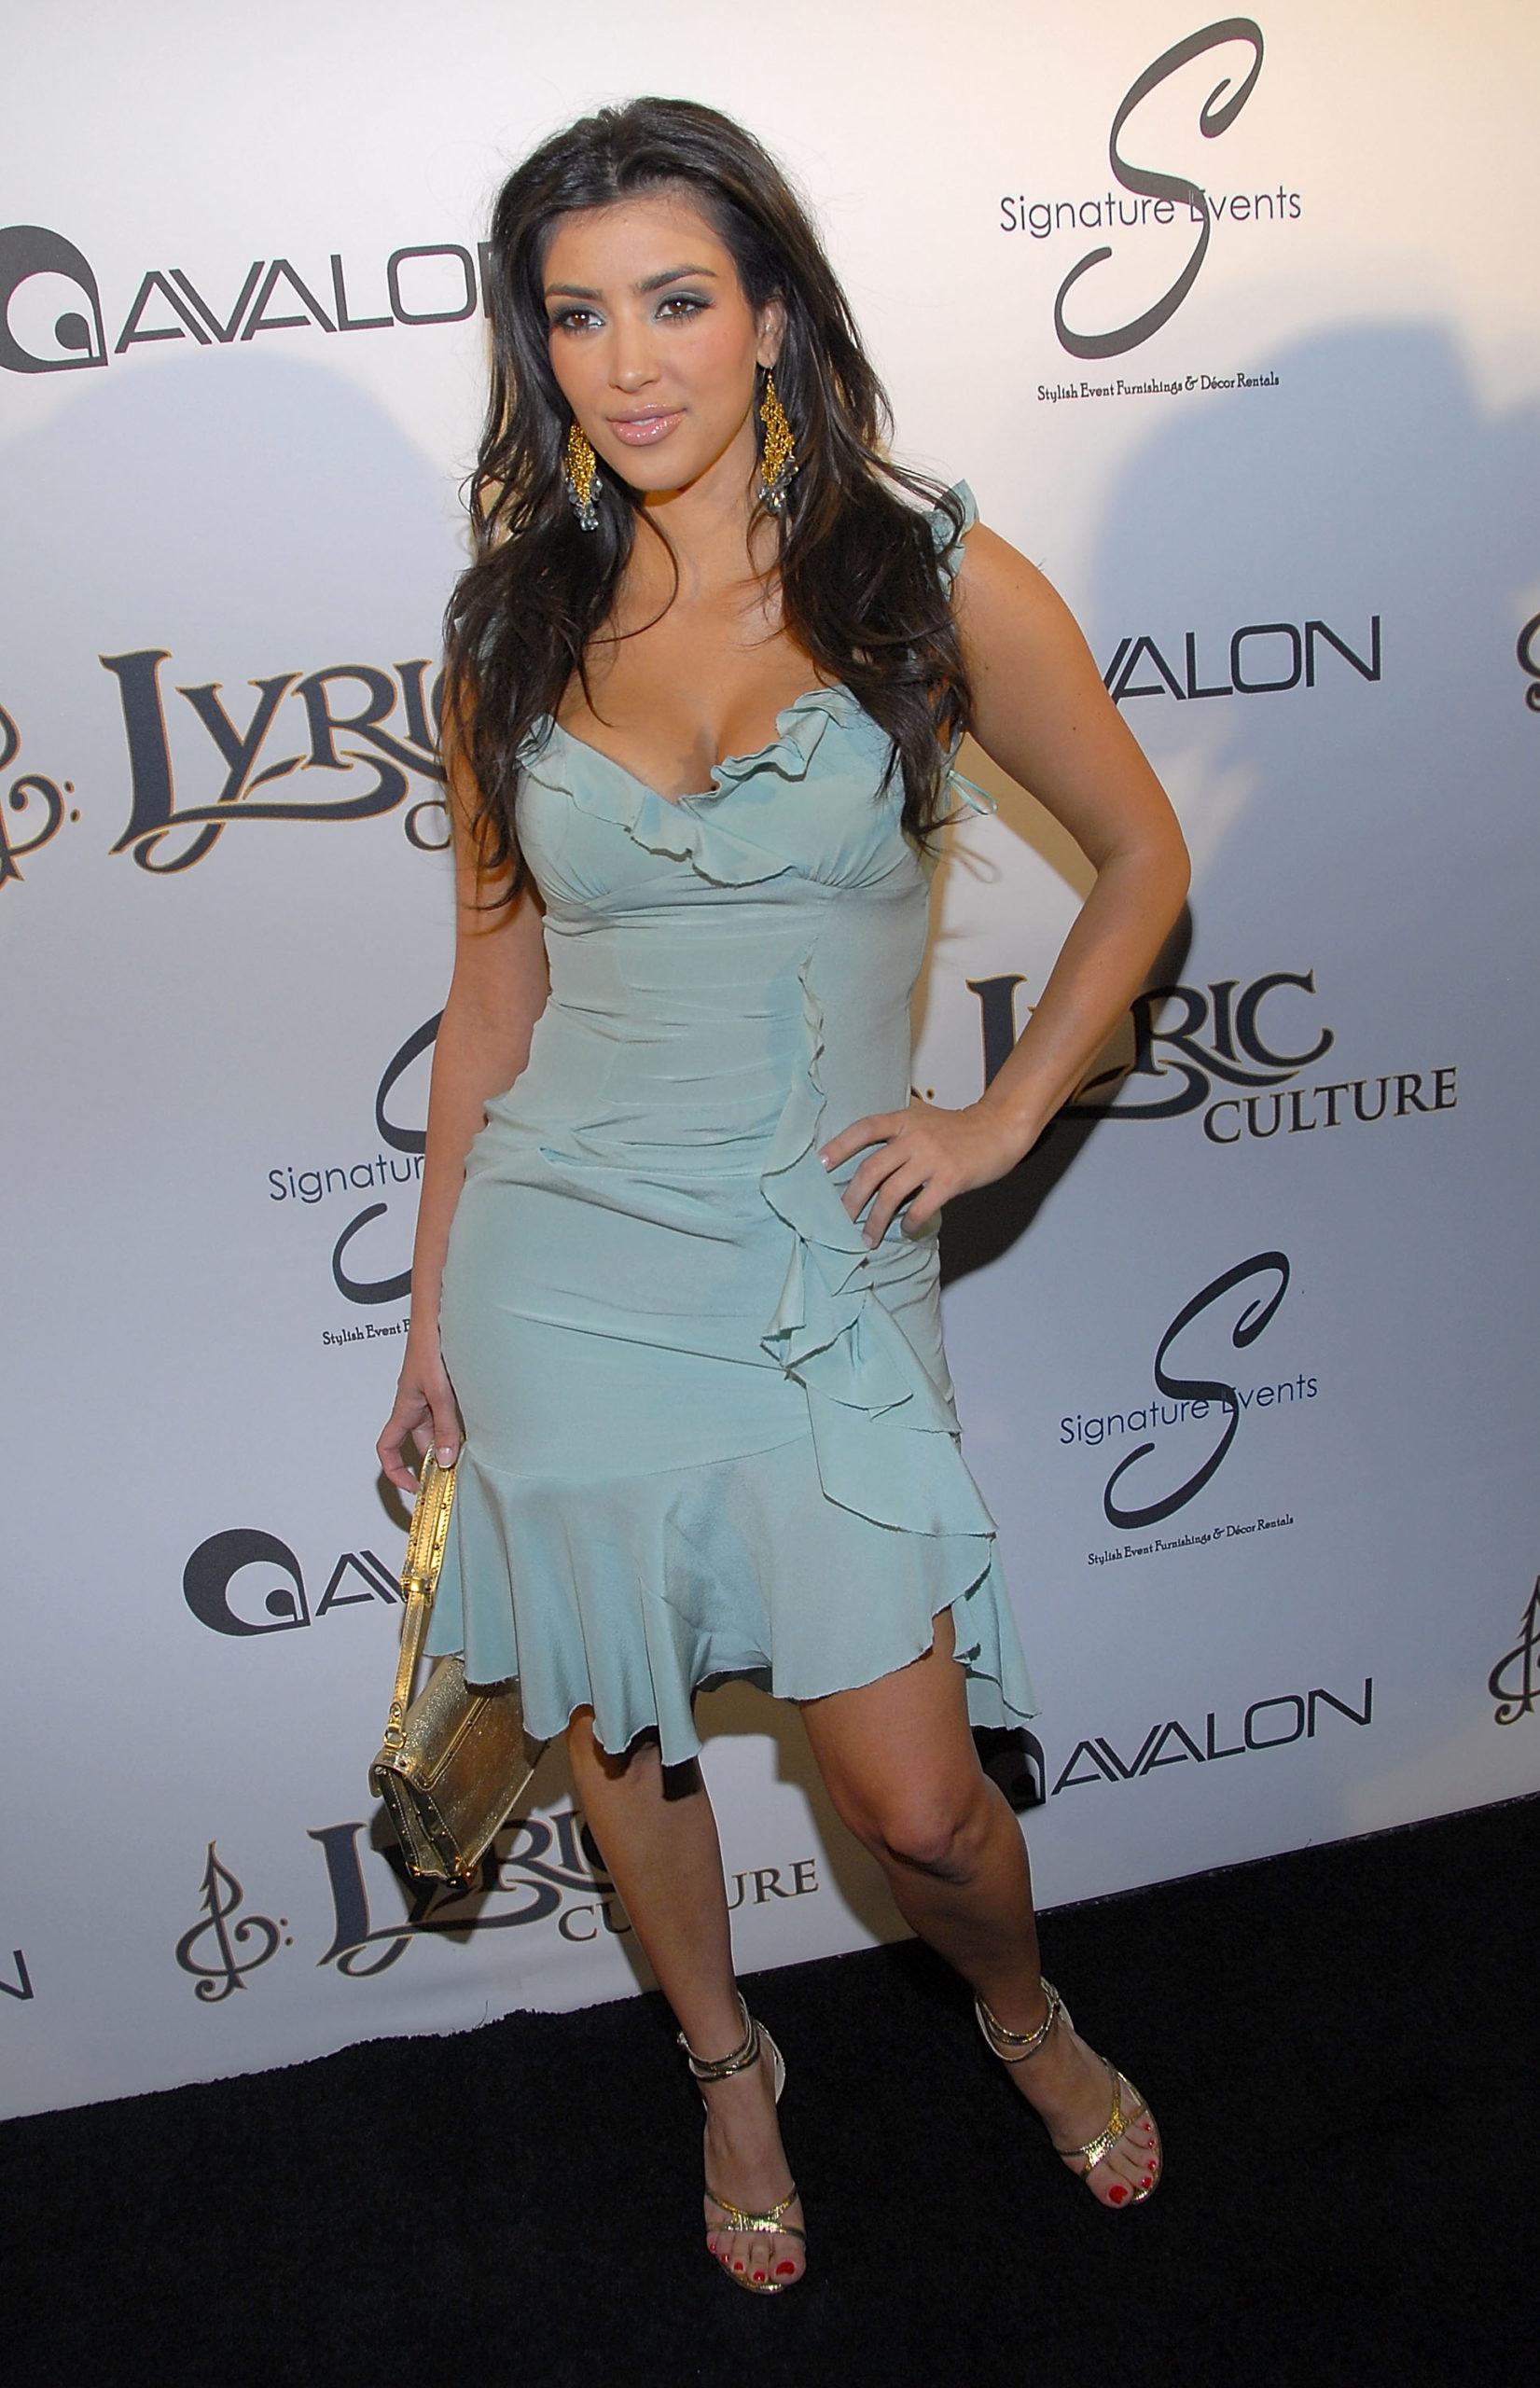 Ким Кардашьян (2007). Фото: Charley Gallay/Getty Images